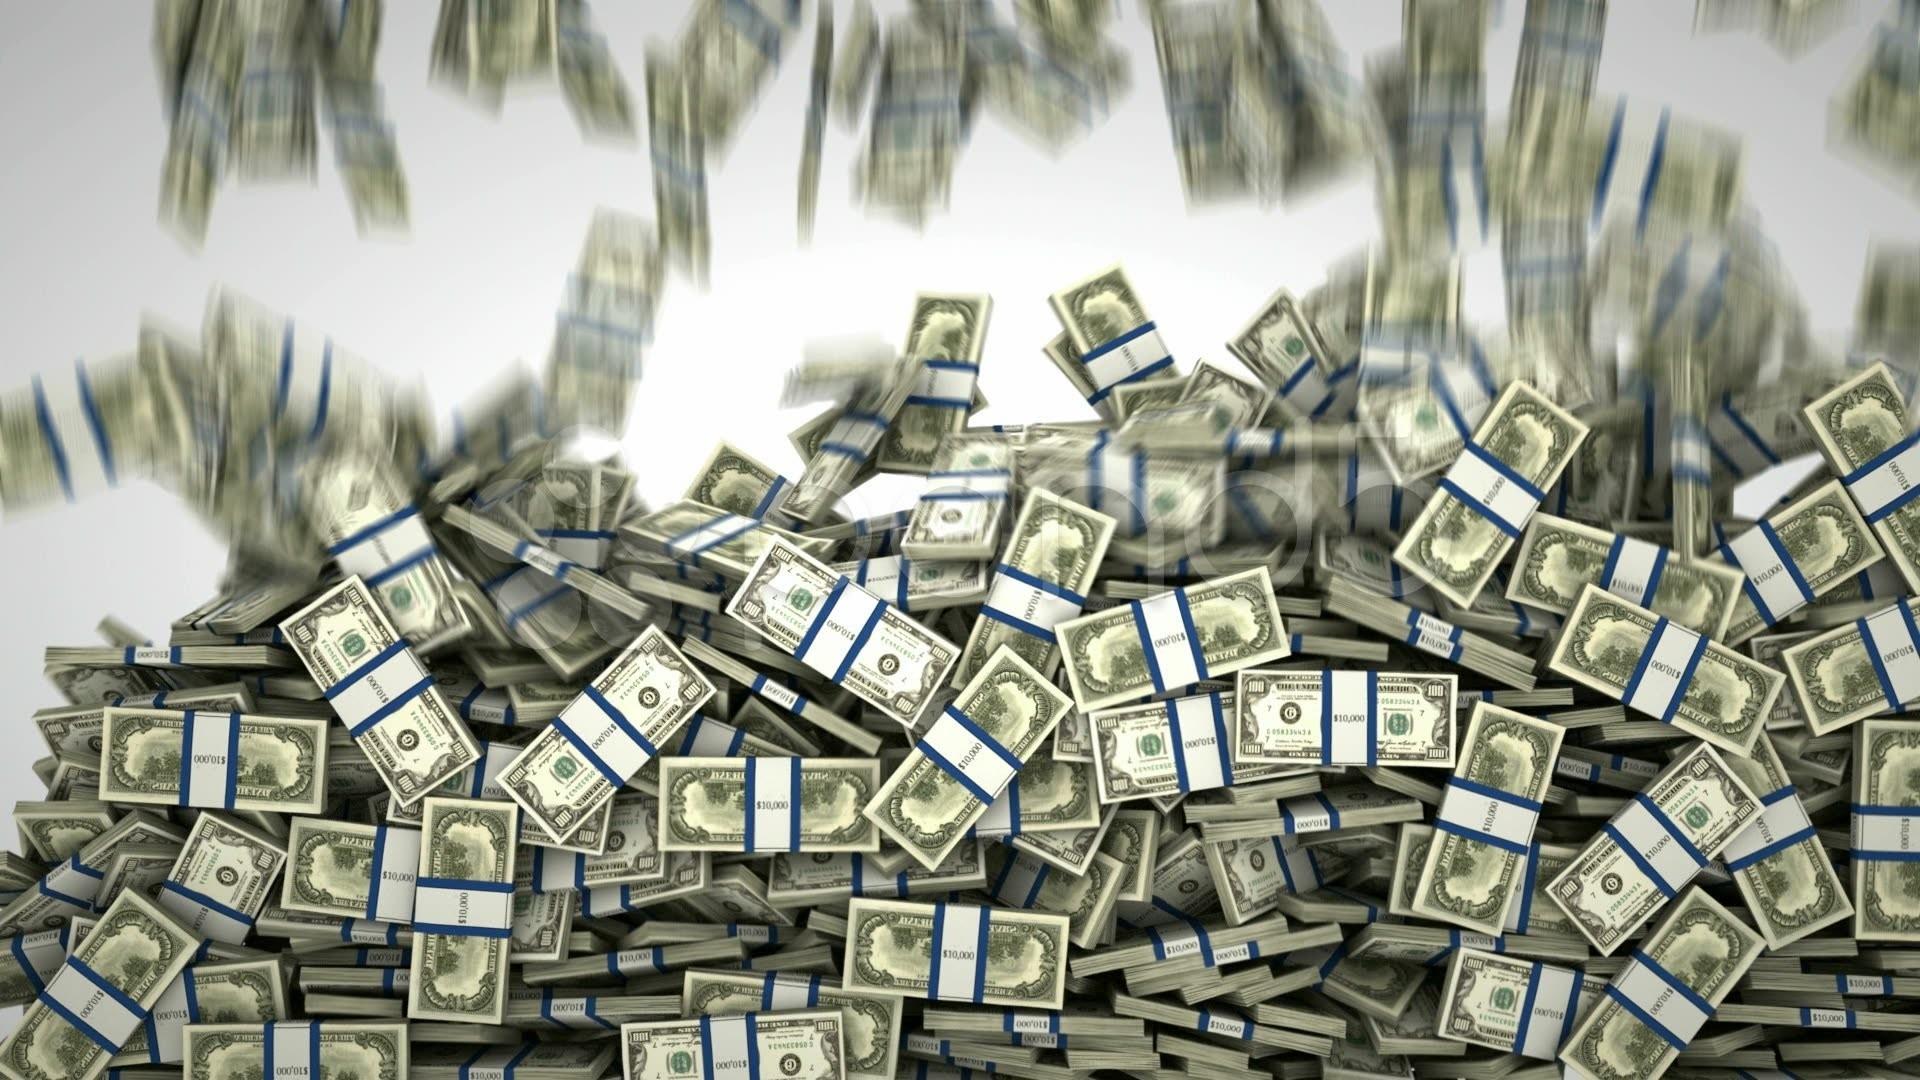 Money Background Wallpaper